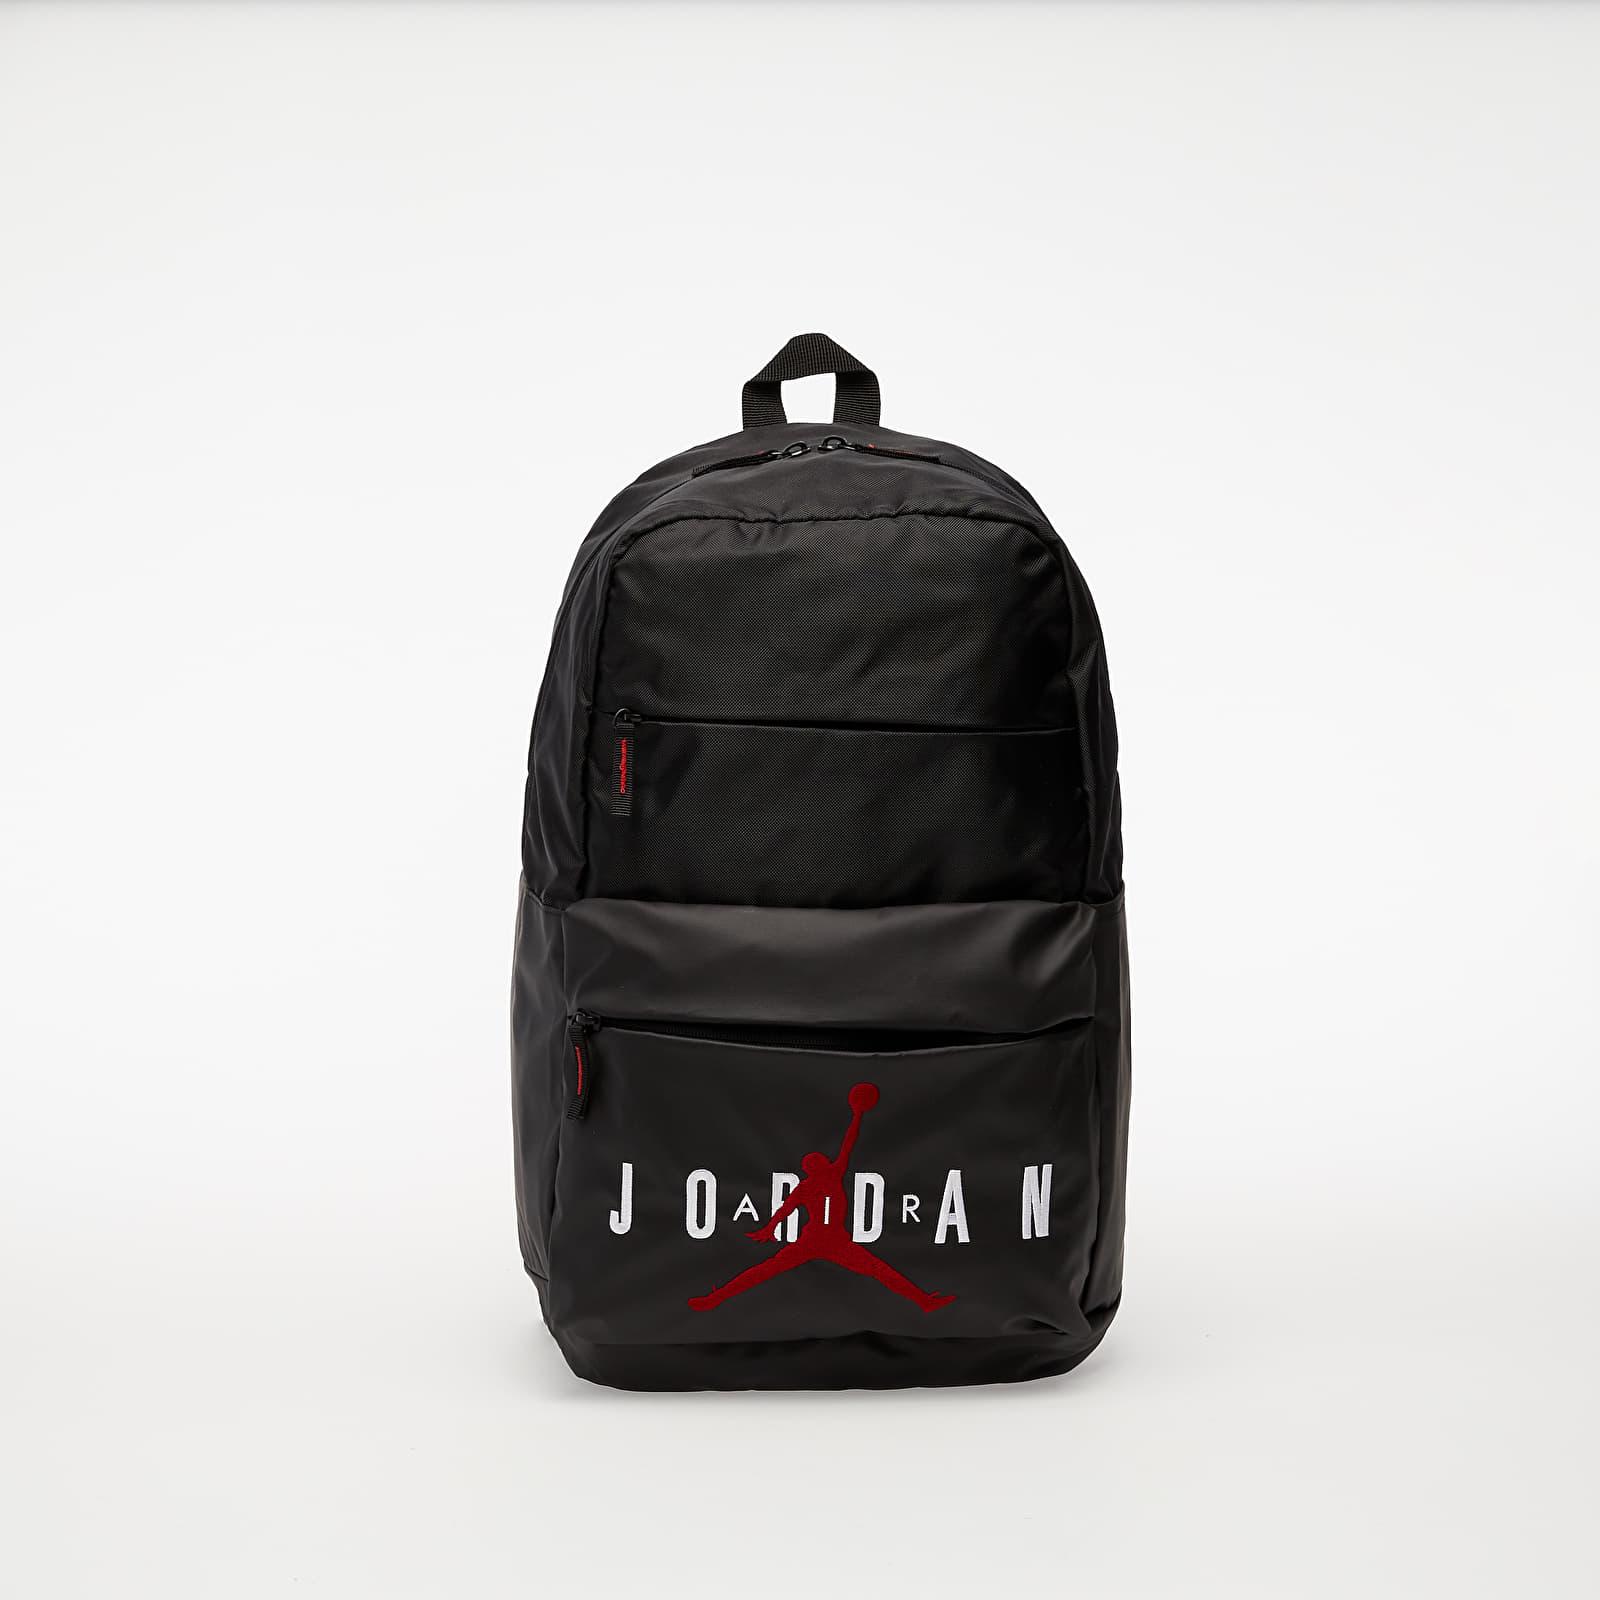 Backpacks Jordan Backpack Black